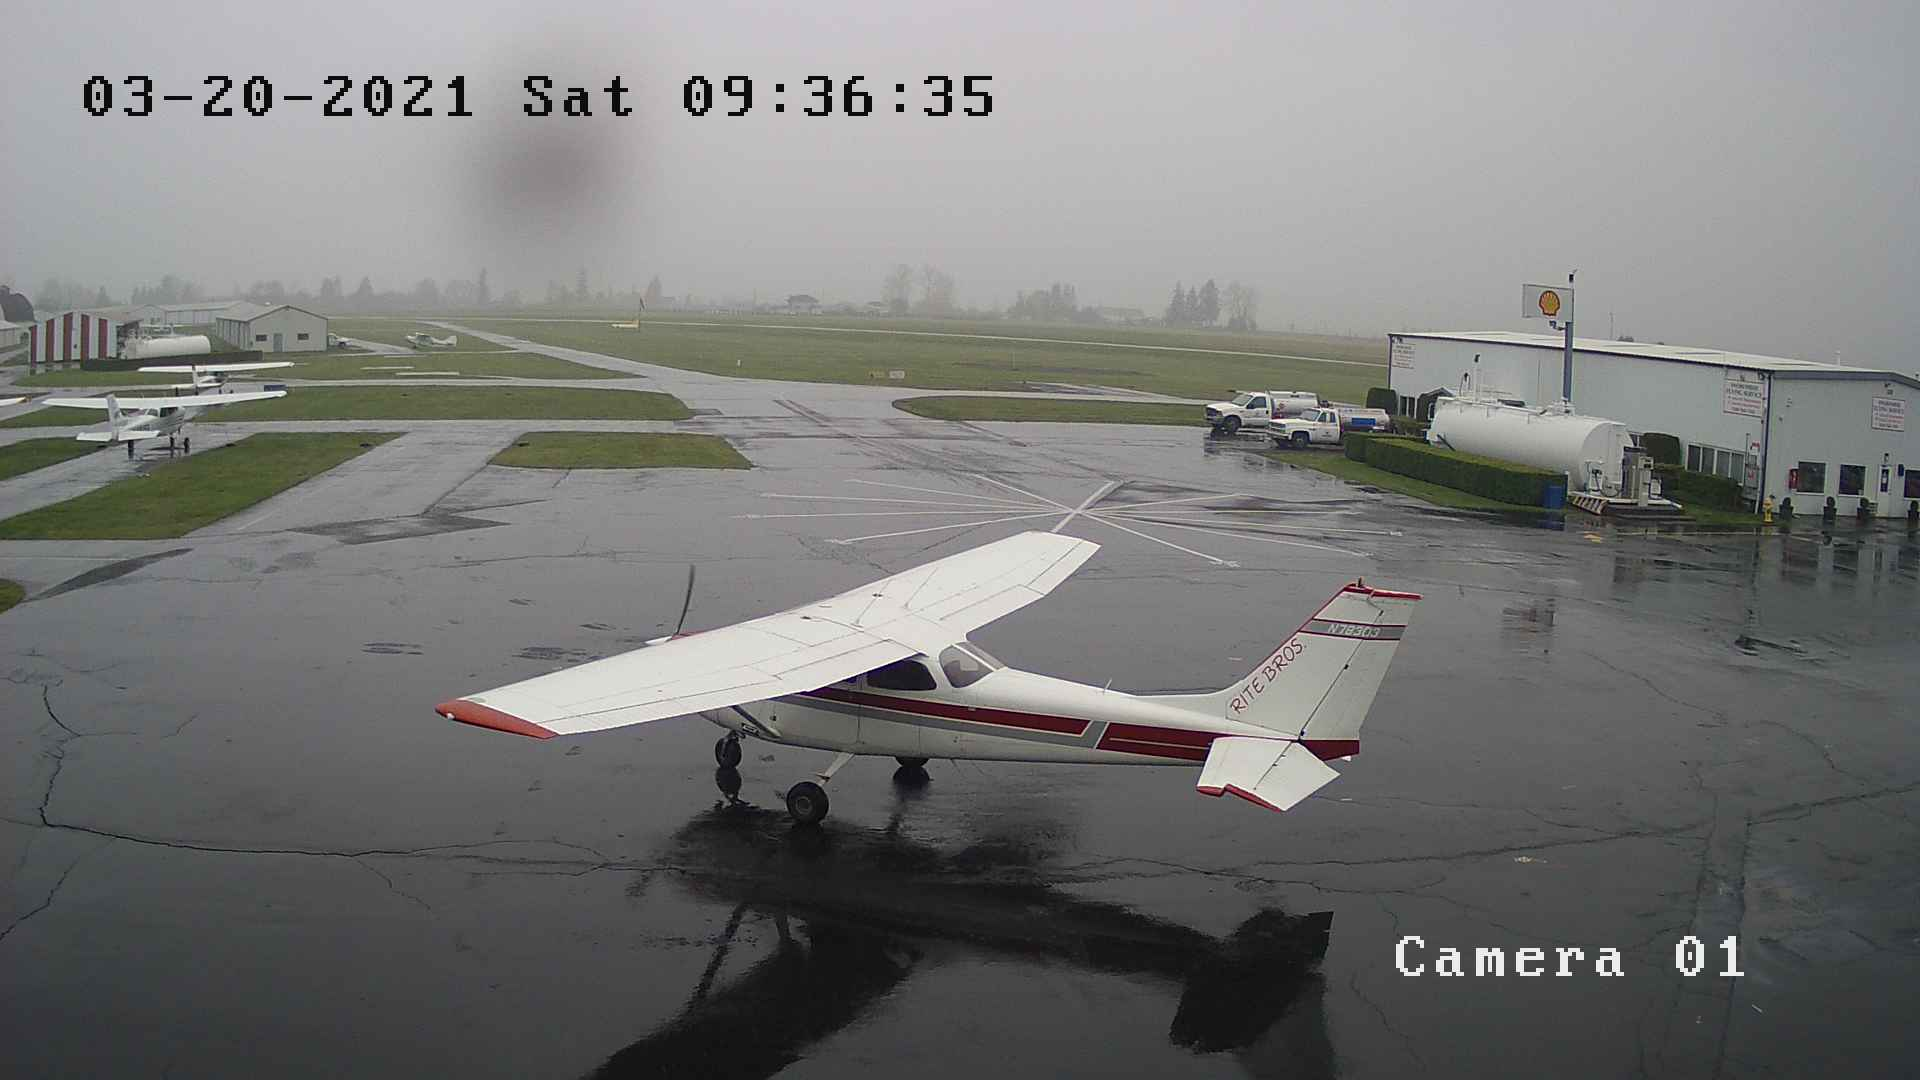 Harvey Airfield(Snohomish) - Washington